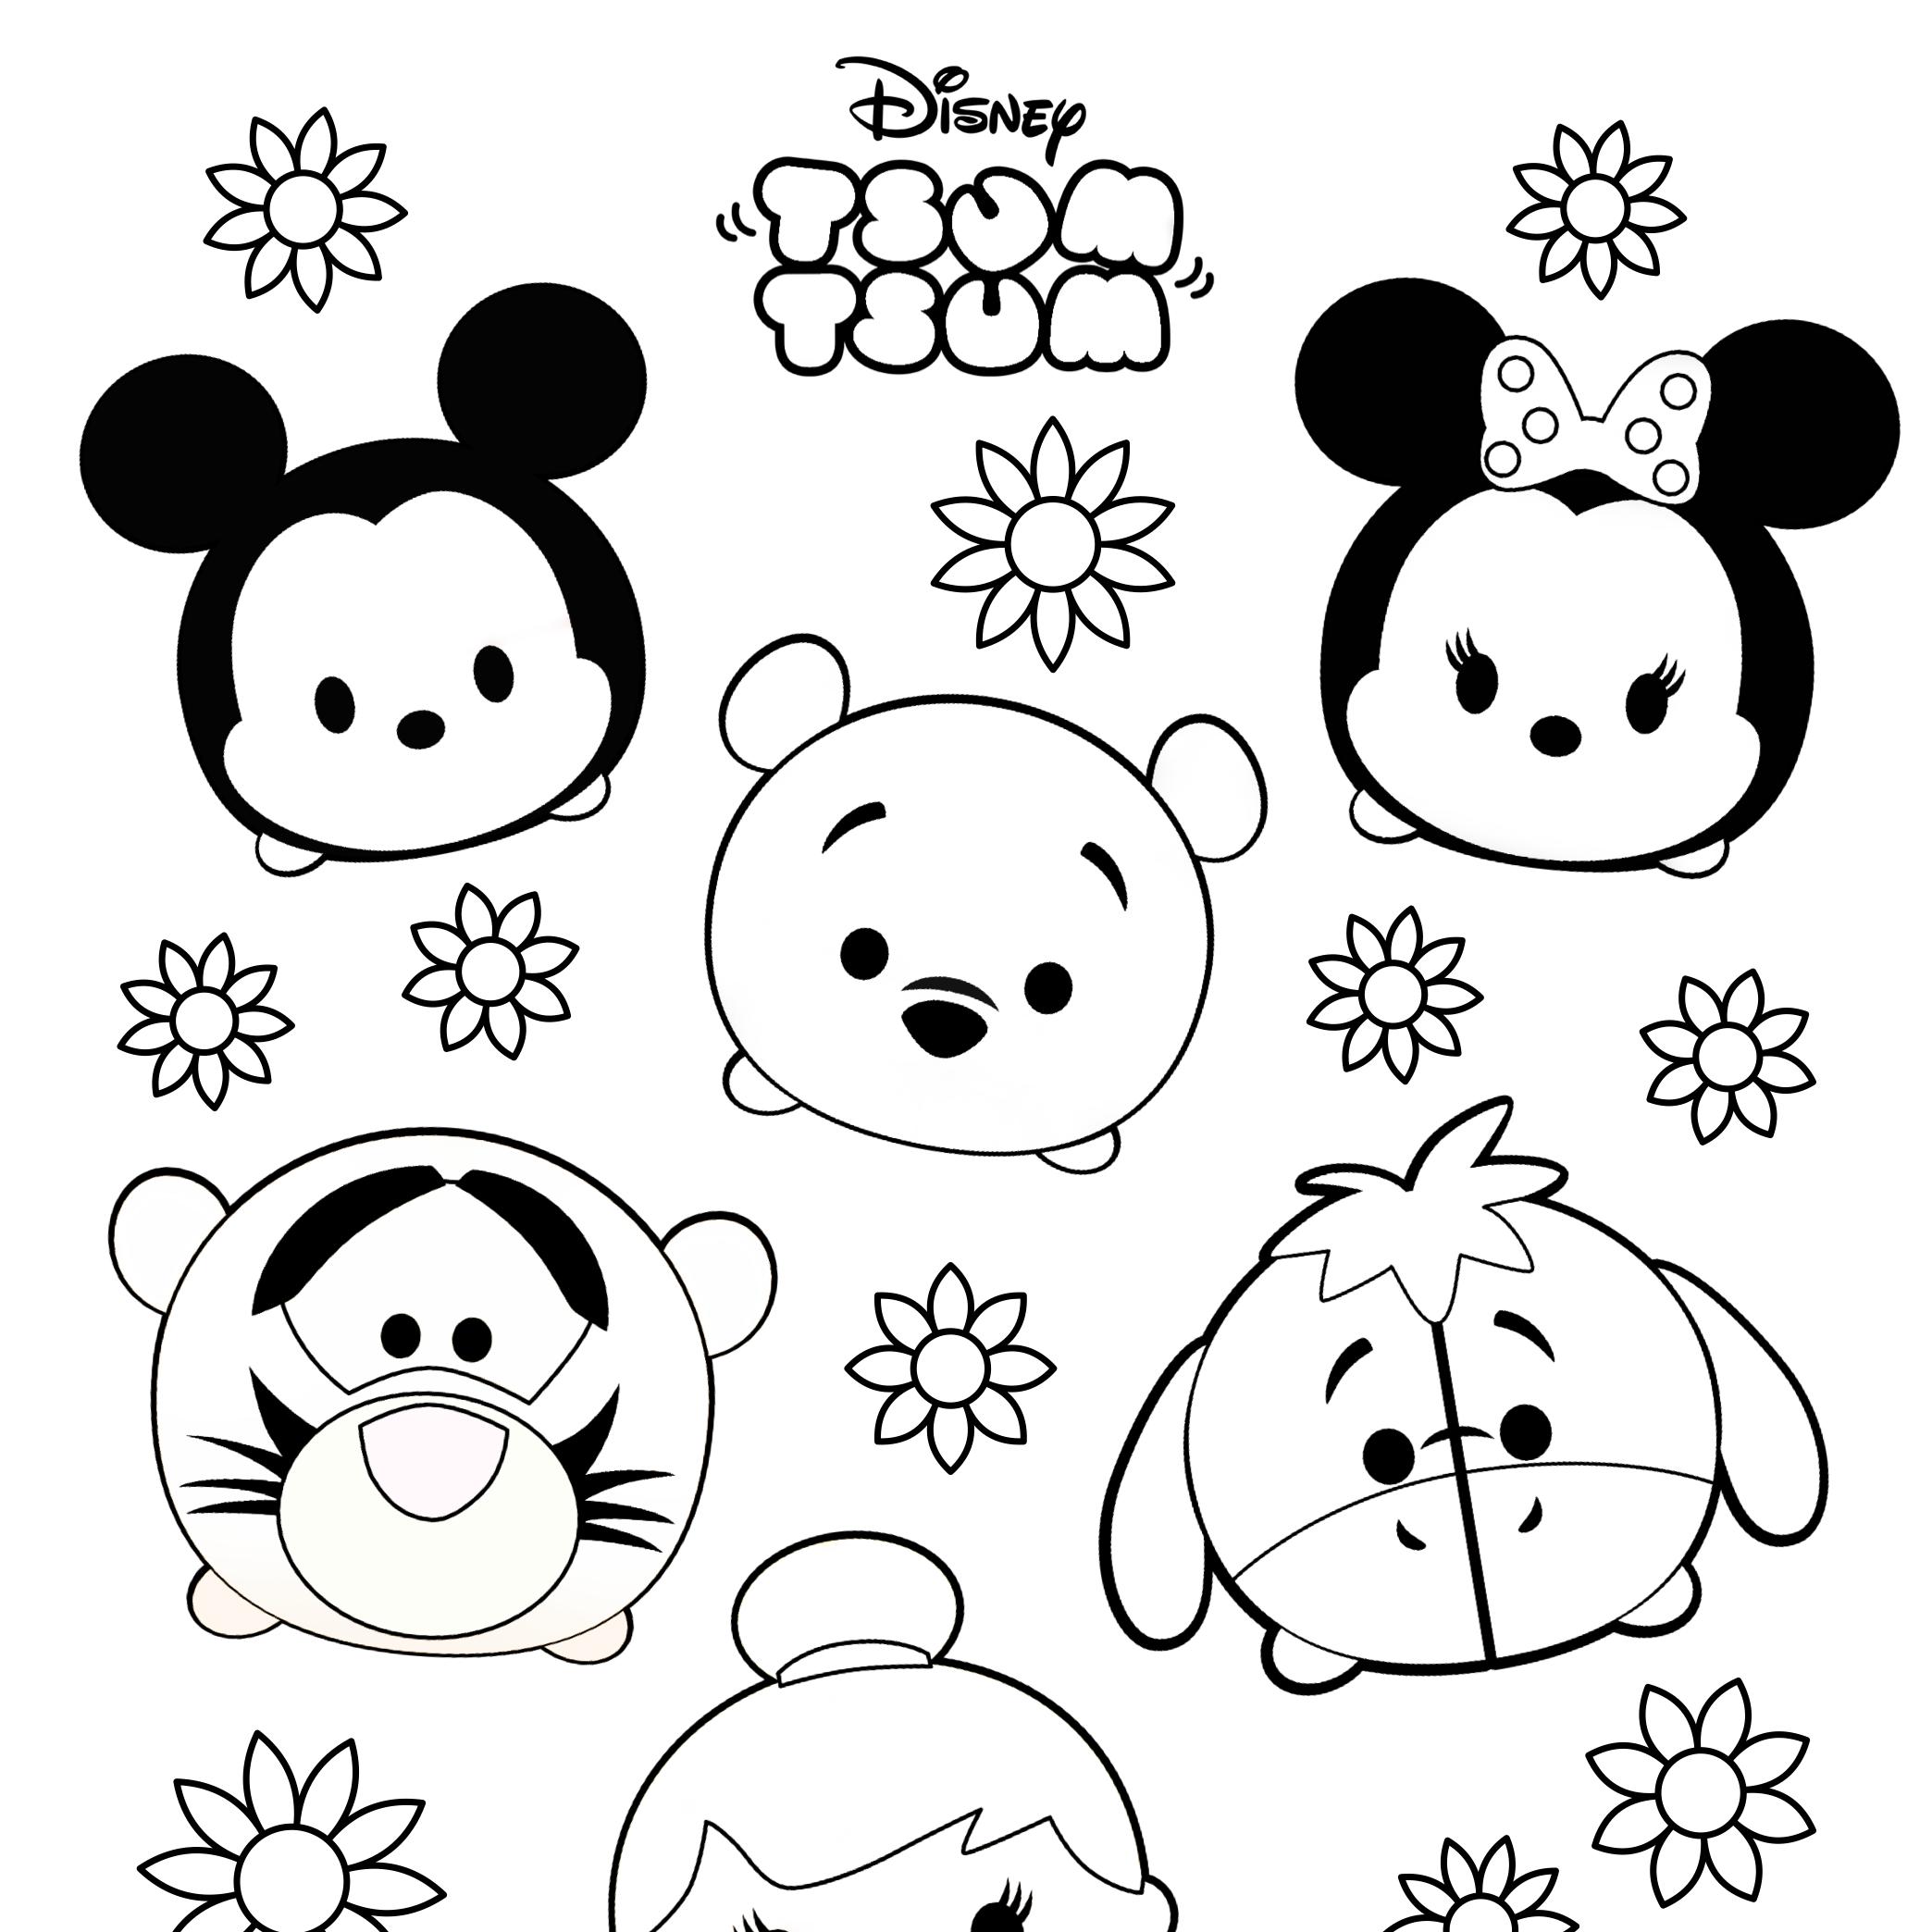 Tsum Tsum Colouring Sheets Free Printable Tsum Tsum Coloring Pages Disney Coloring Pages Cute Coloring Pages